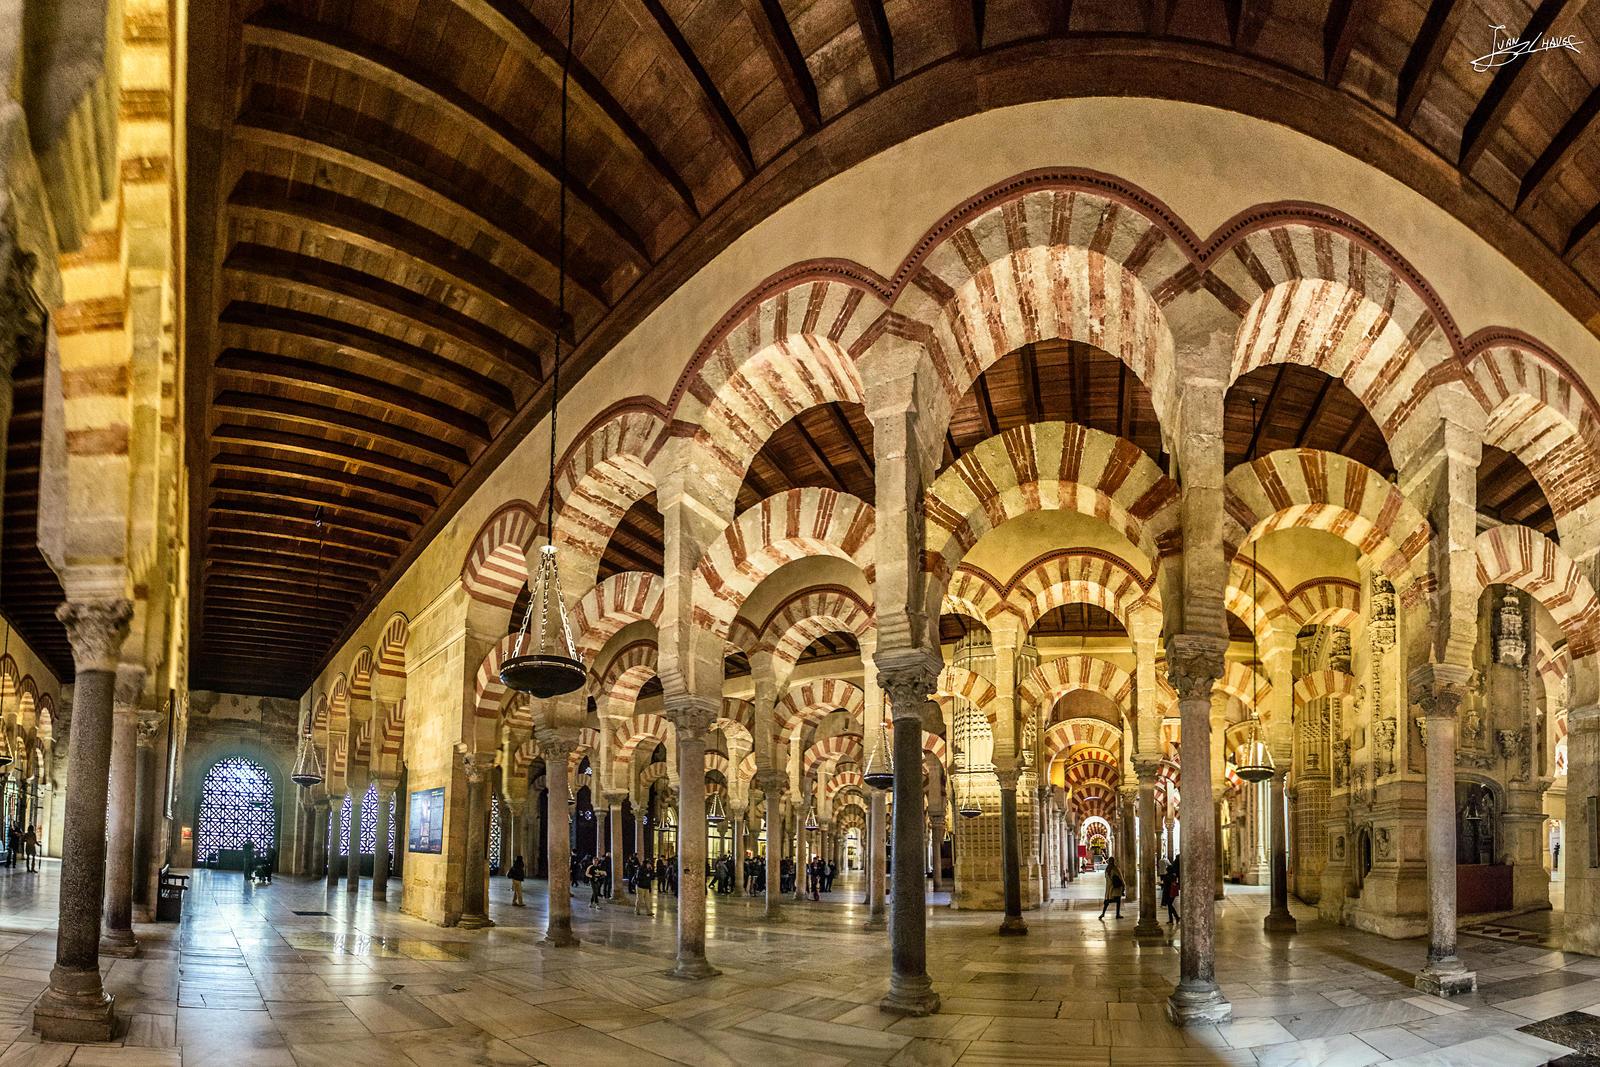 Mezquita Catedral De Cordoba By Juanchaves On Deviantart